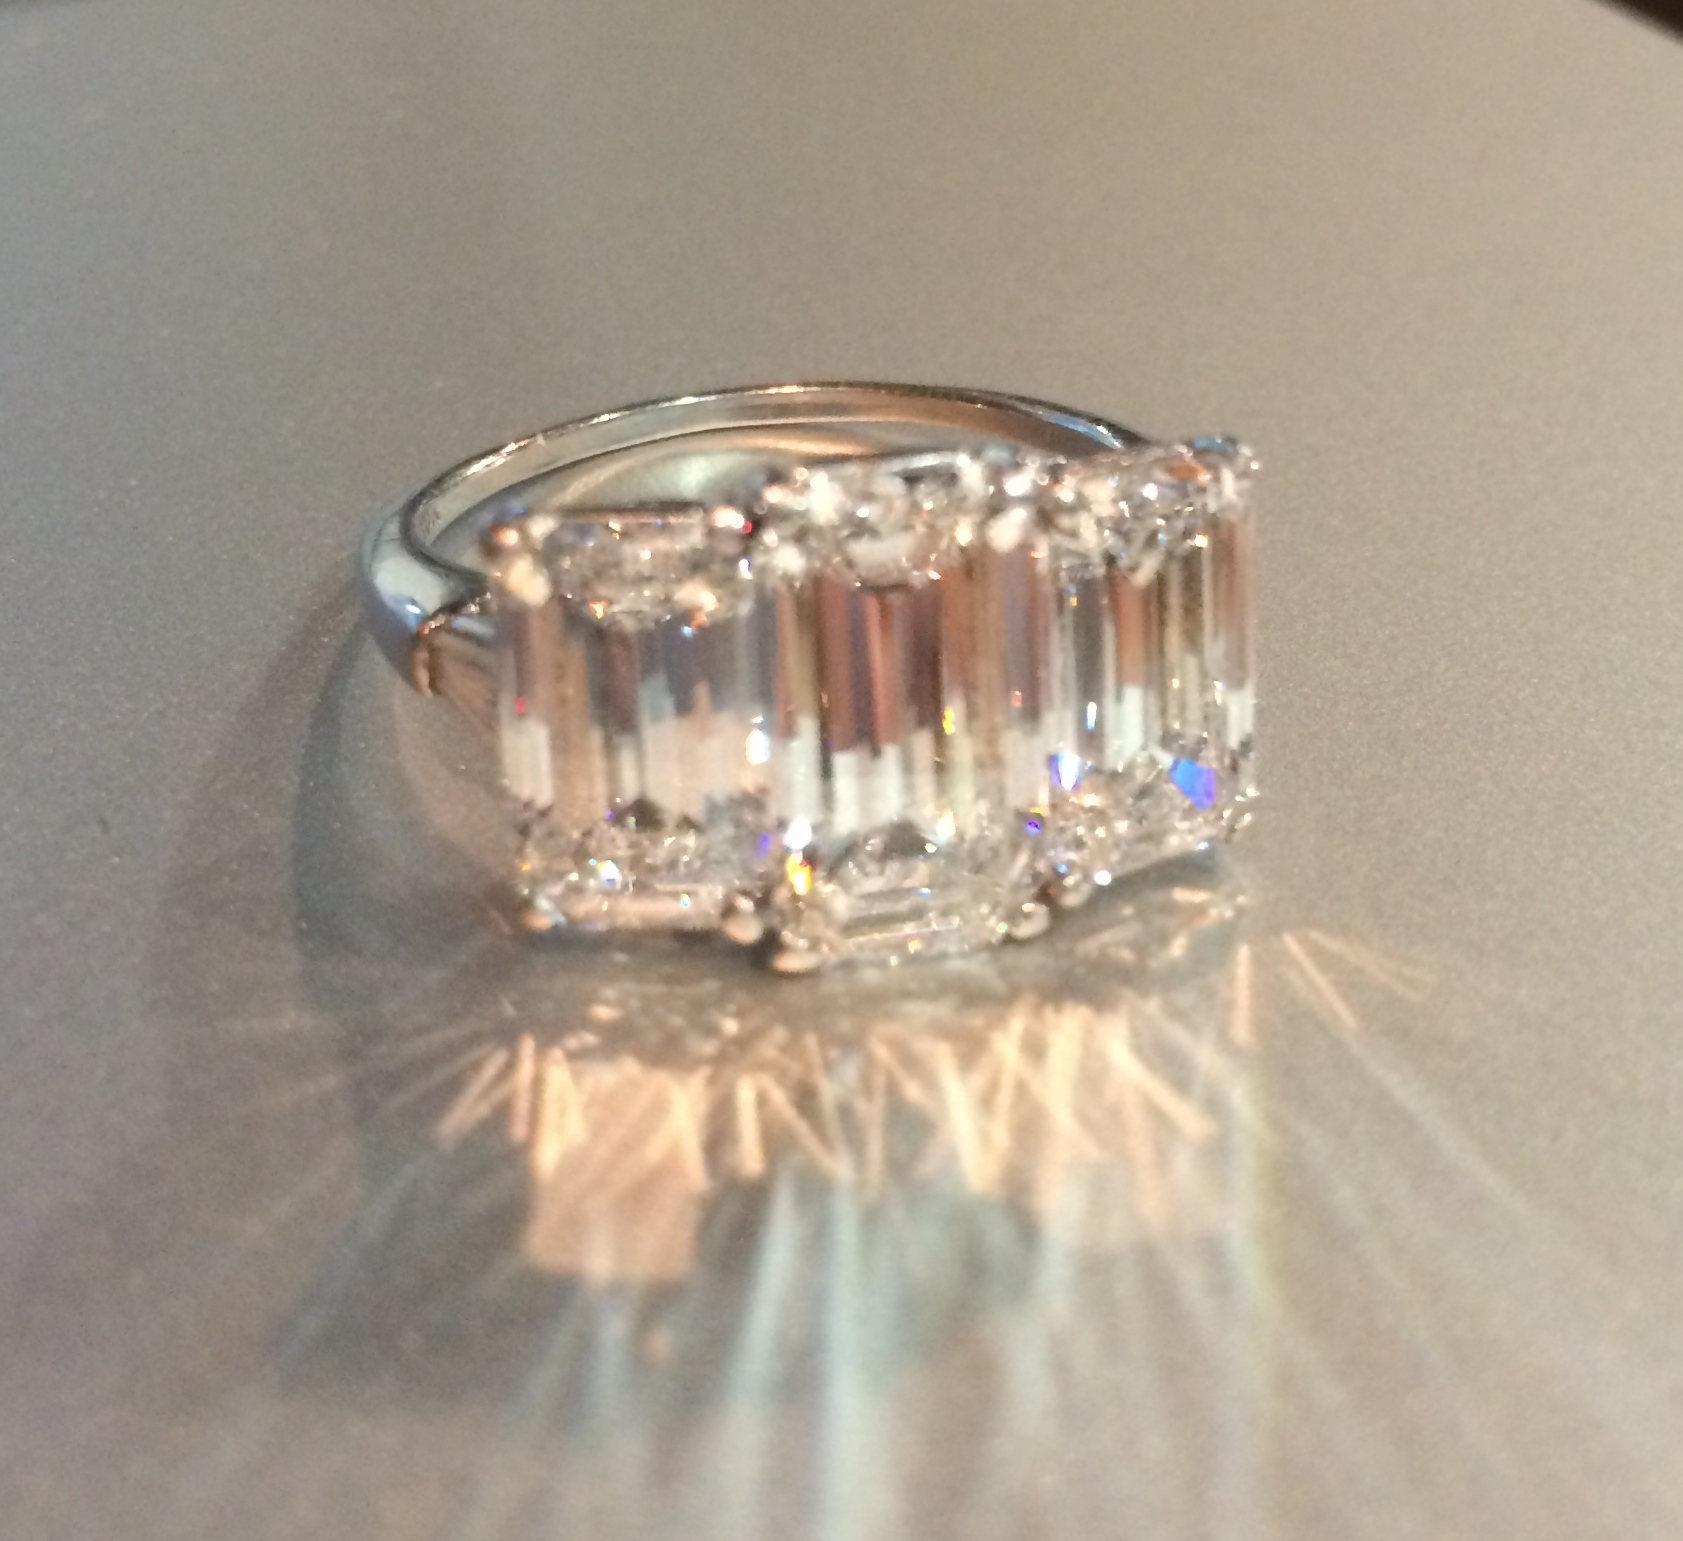 An emerald cut Harry Winston diamond ring.